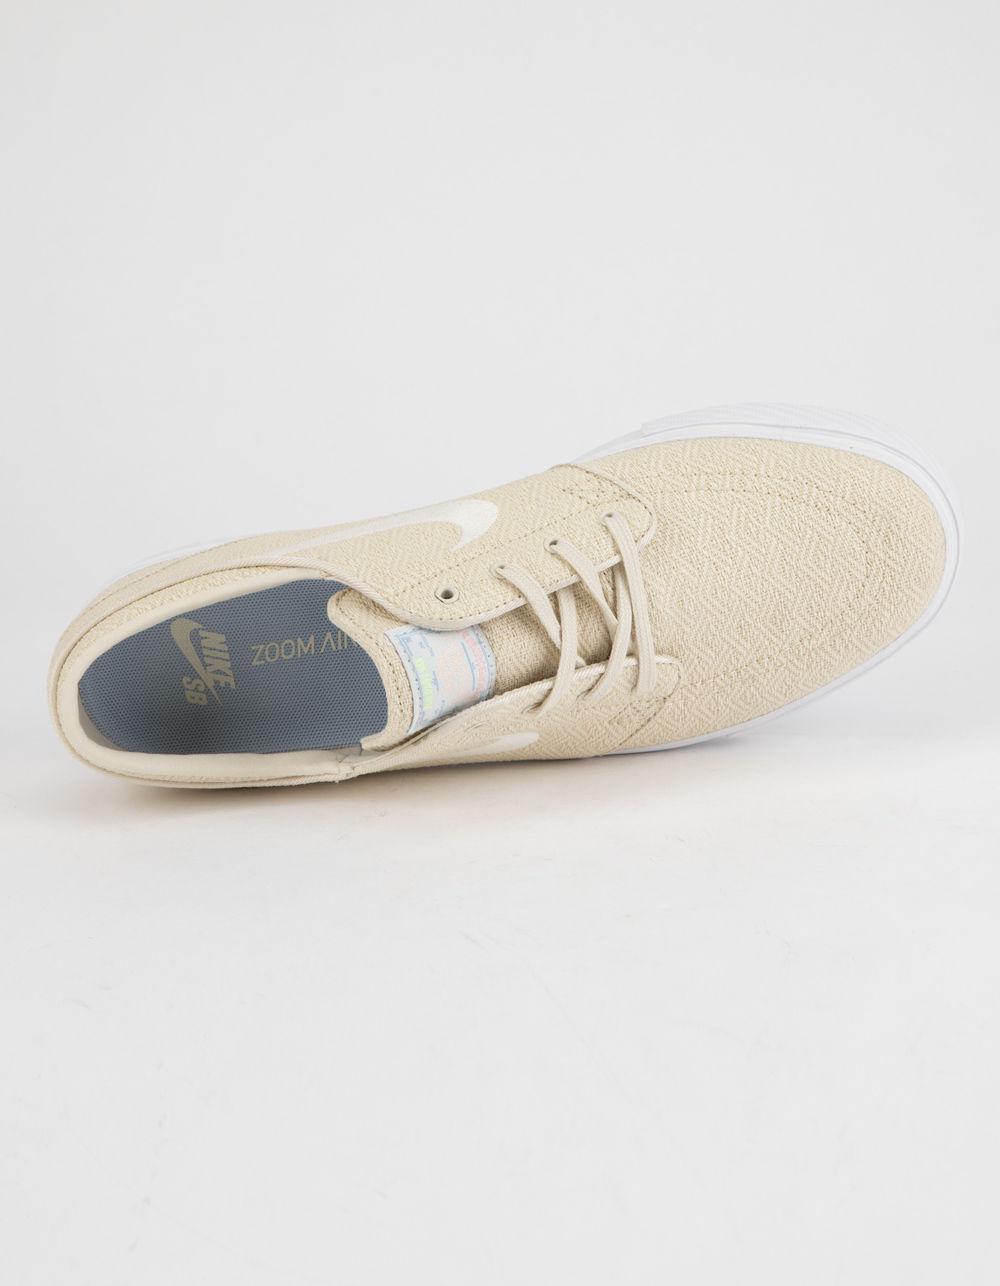 36710519f382 Nike - Zoom Stefan Janoski Canvas Fossil   Sail White Mens Shoes for Men -  Lyst. View fullscreen